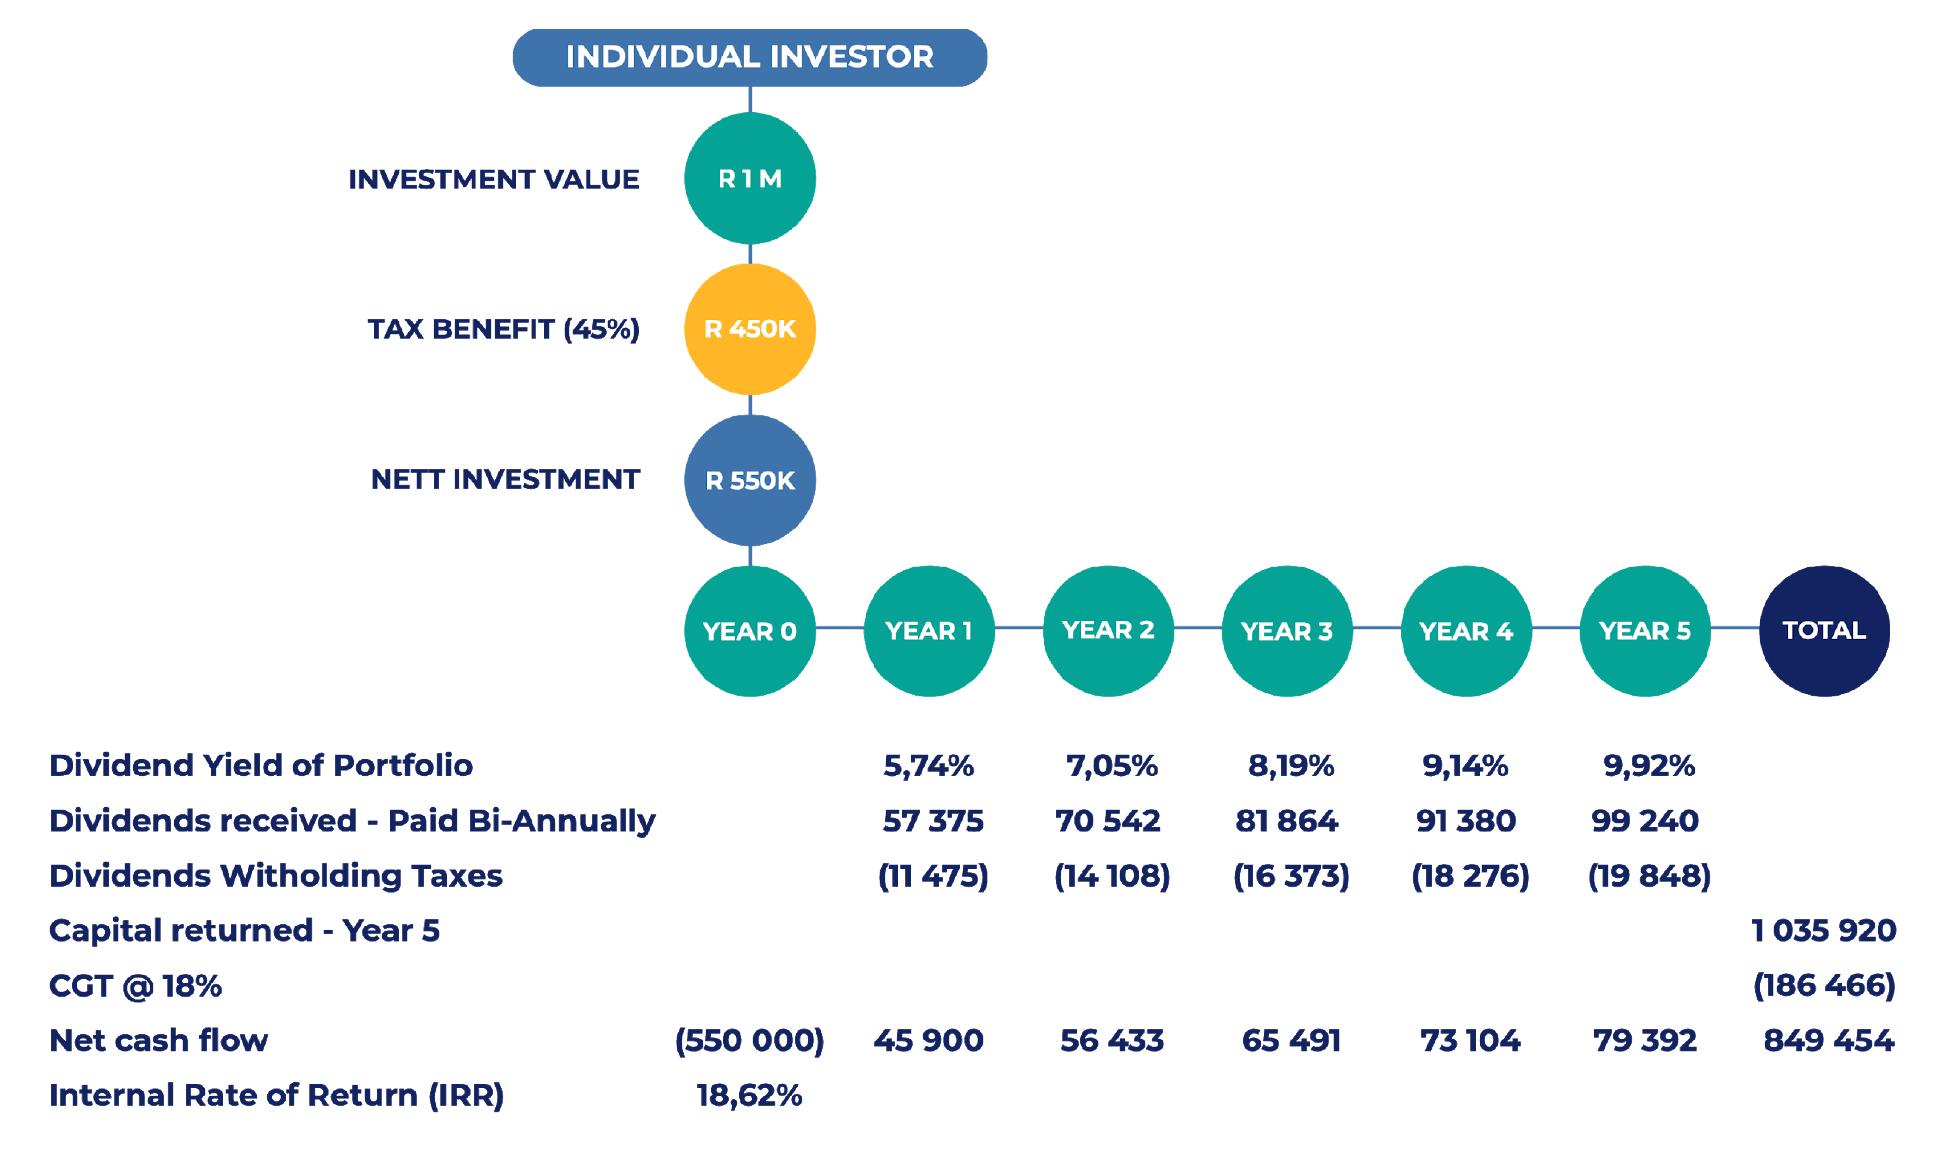 MeTTa Capital: Anticipated Return Profile